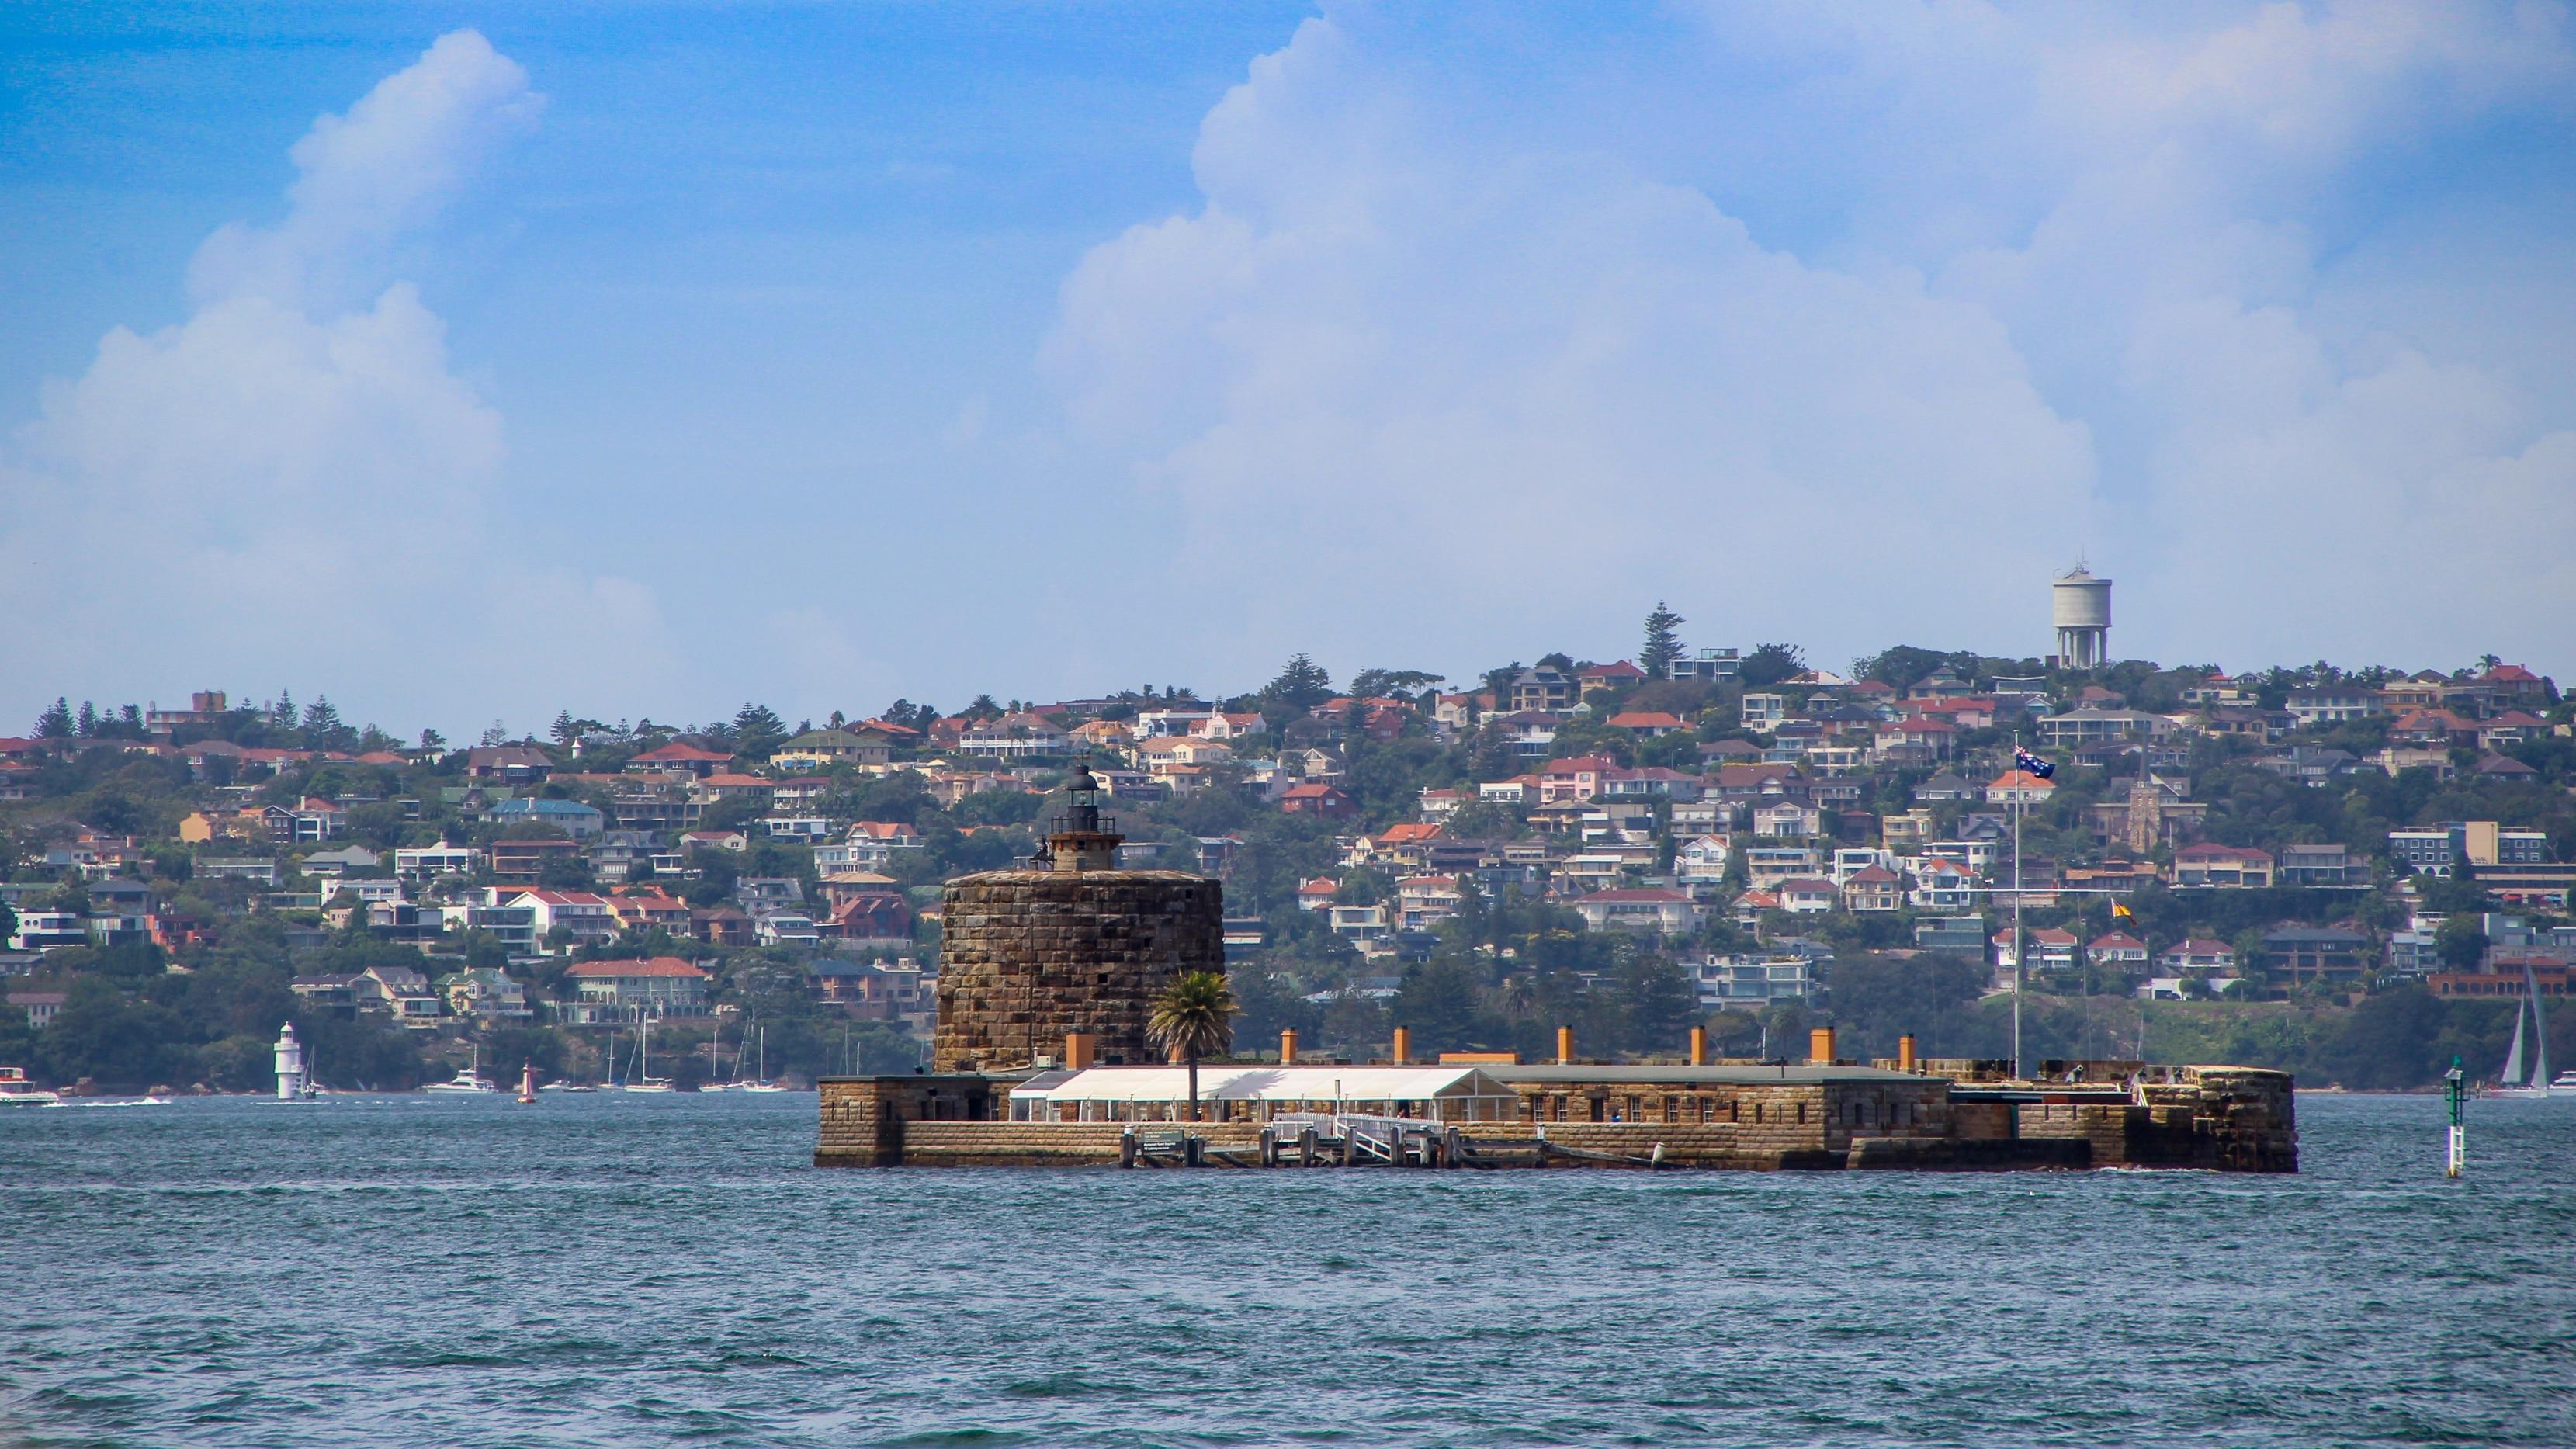 Port Denison, Western Australia, Australien